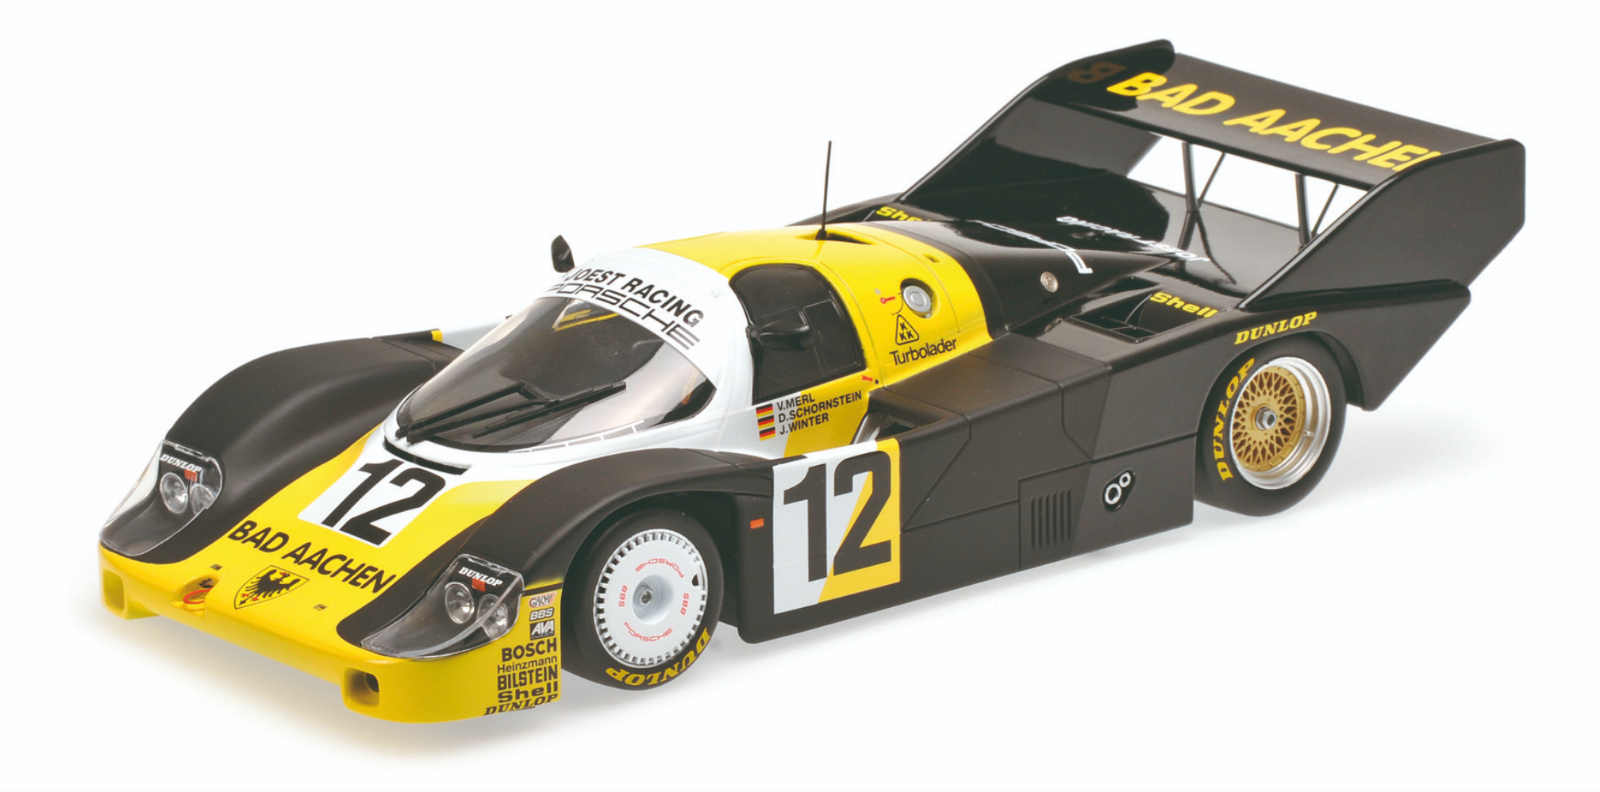 1 18 Porsche 956K n°12 Monza 1984 1 18 • Minichamps 155846612